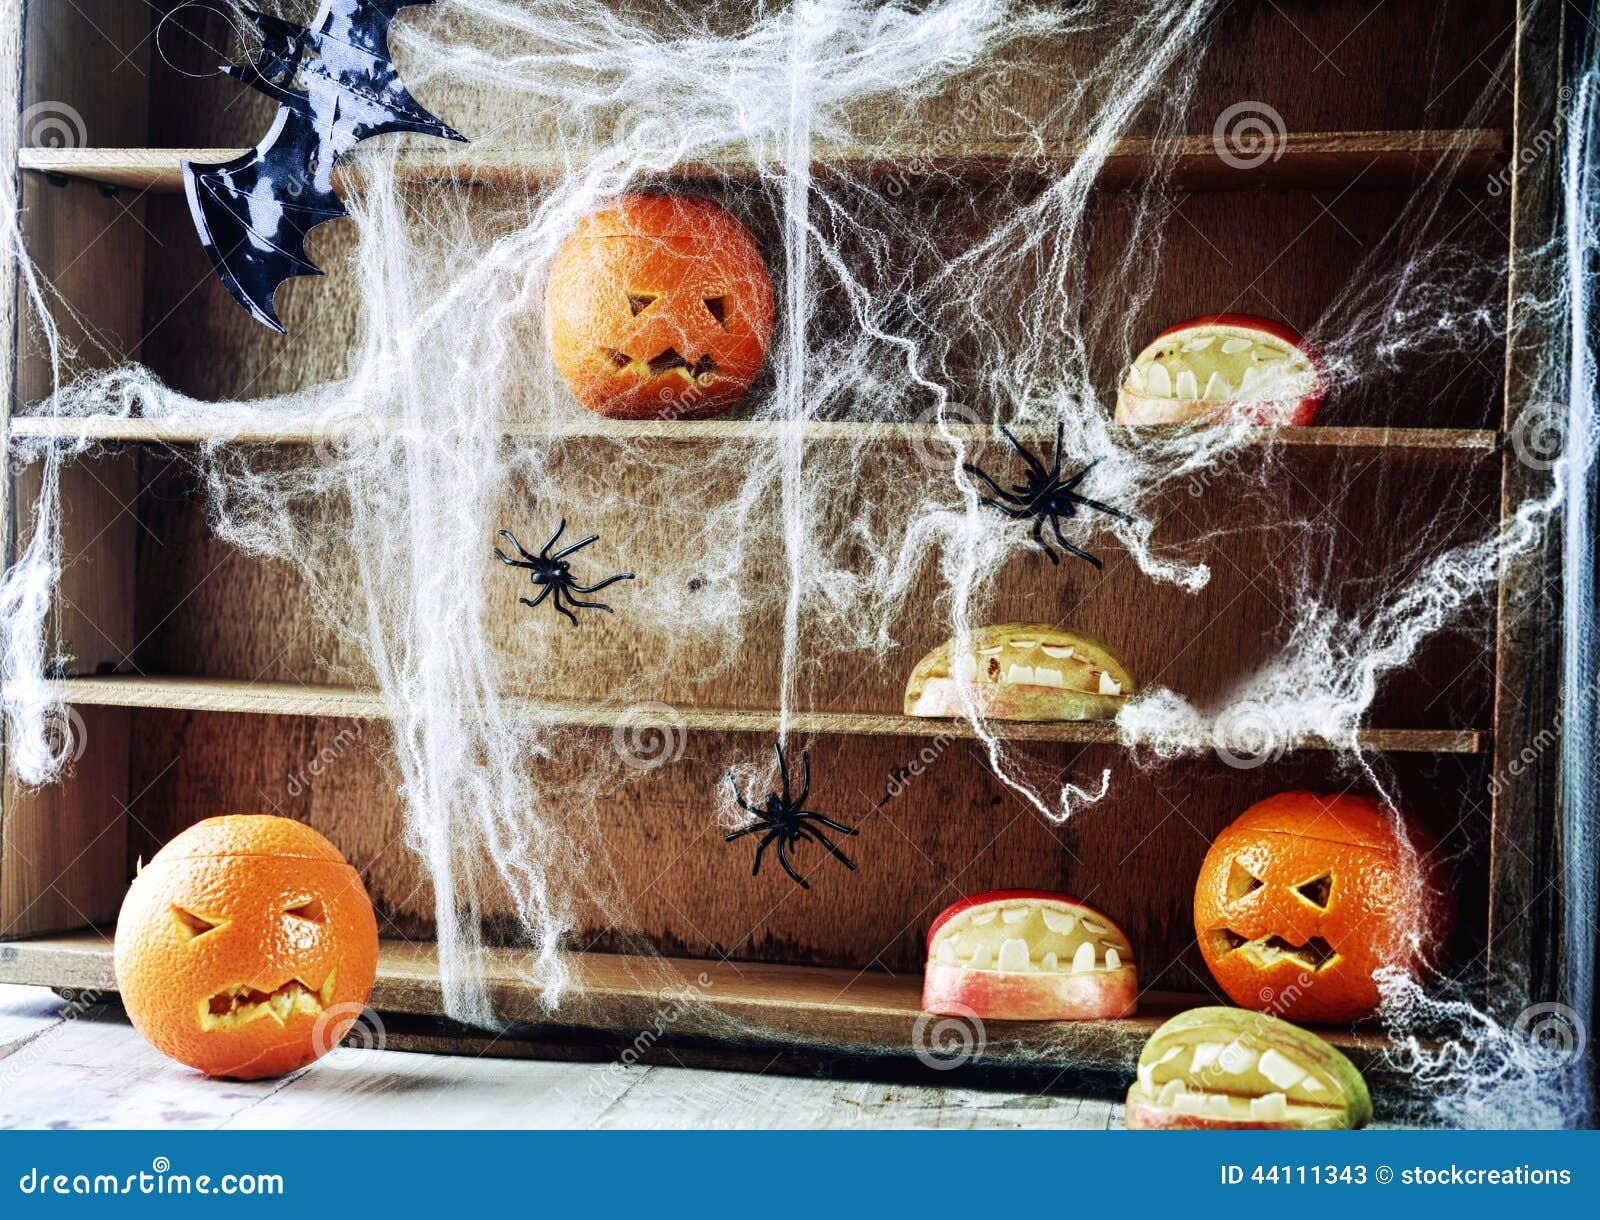 Spooky Halloween pantry with pumpkin lanterns